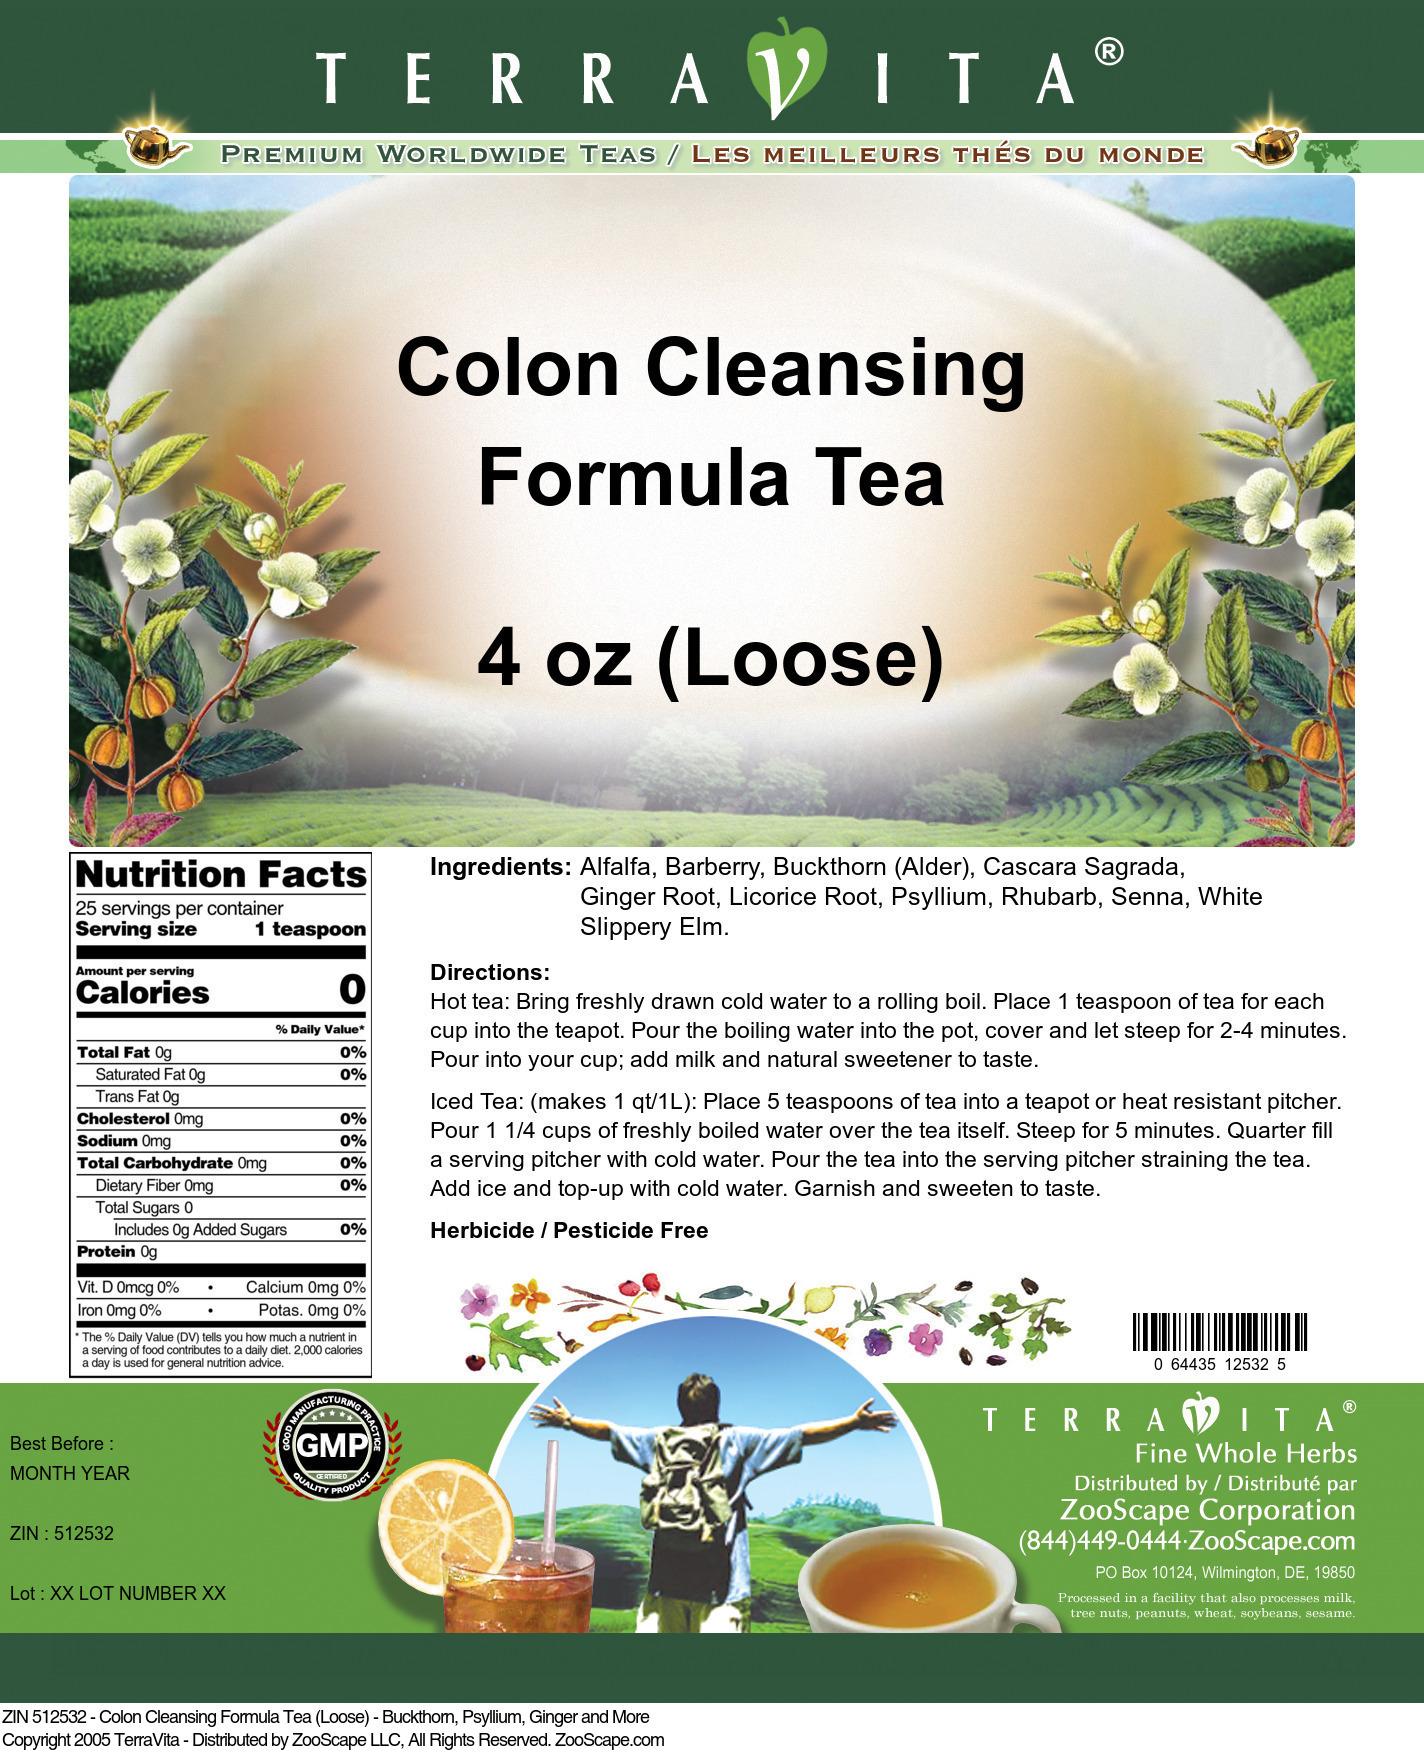 Colon Cleansing Formula Tea (Loose) - Buckthorn, Psyllium, Ginger and More